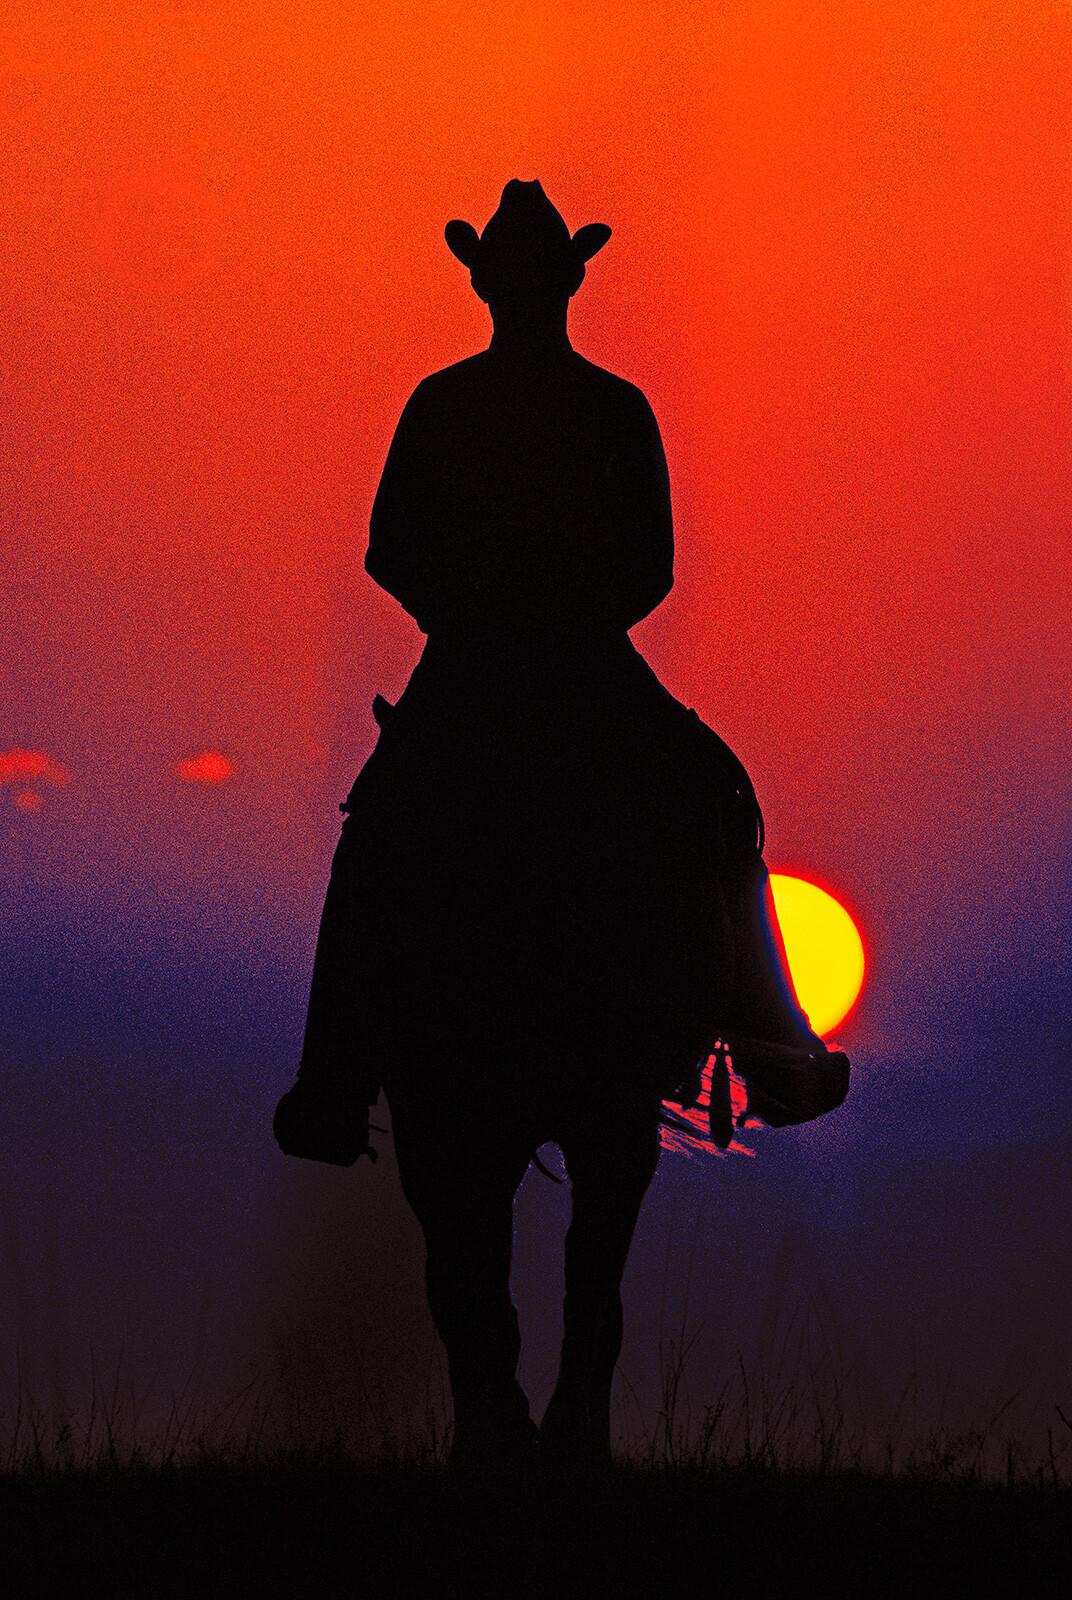 Lonely Cowboy, Texas - Dieter Blum